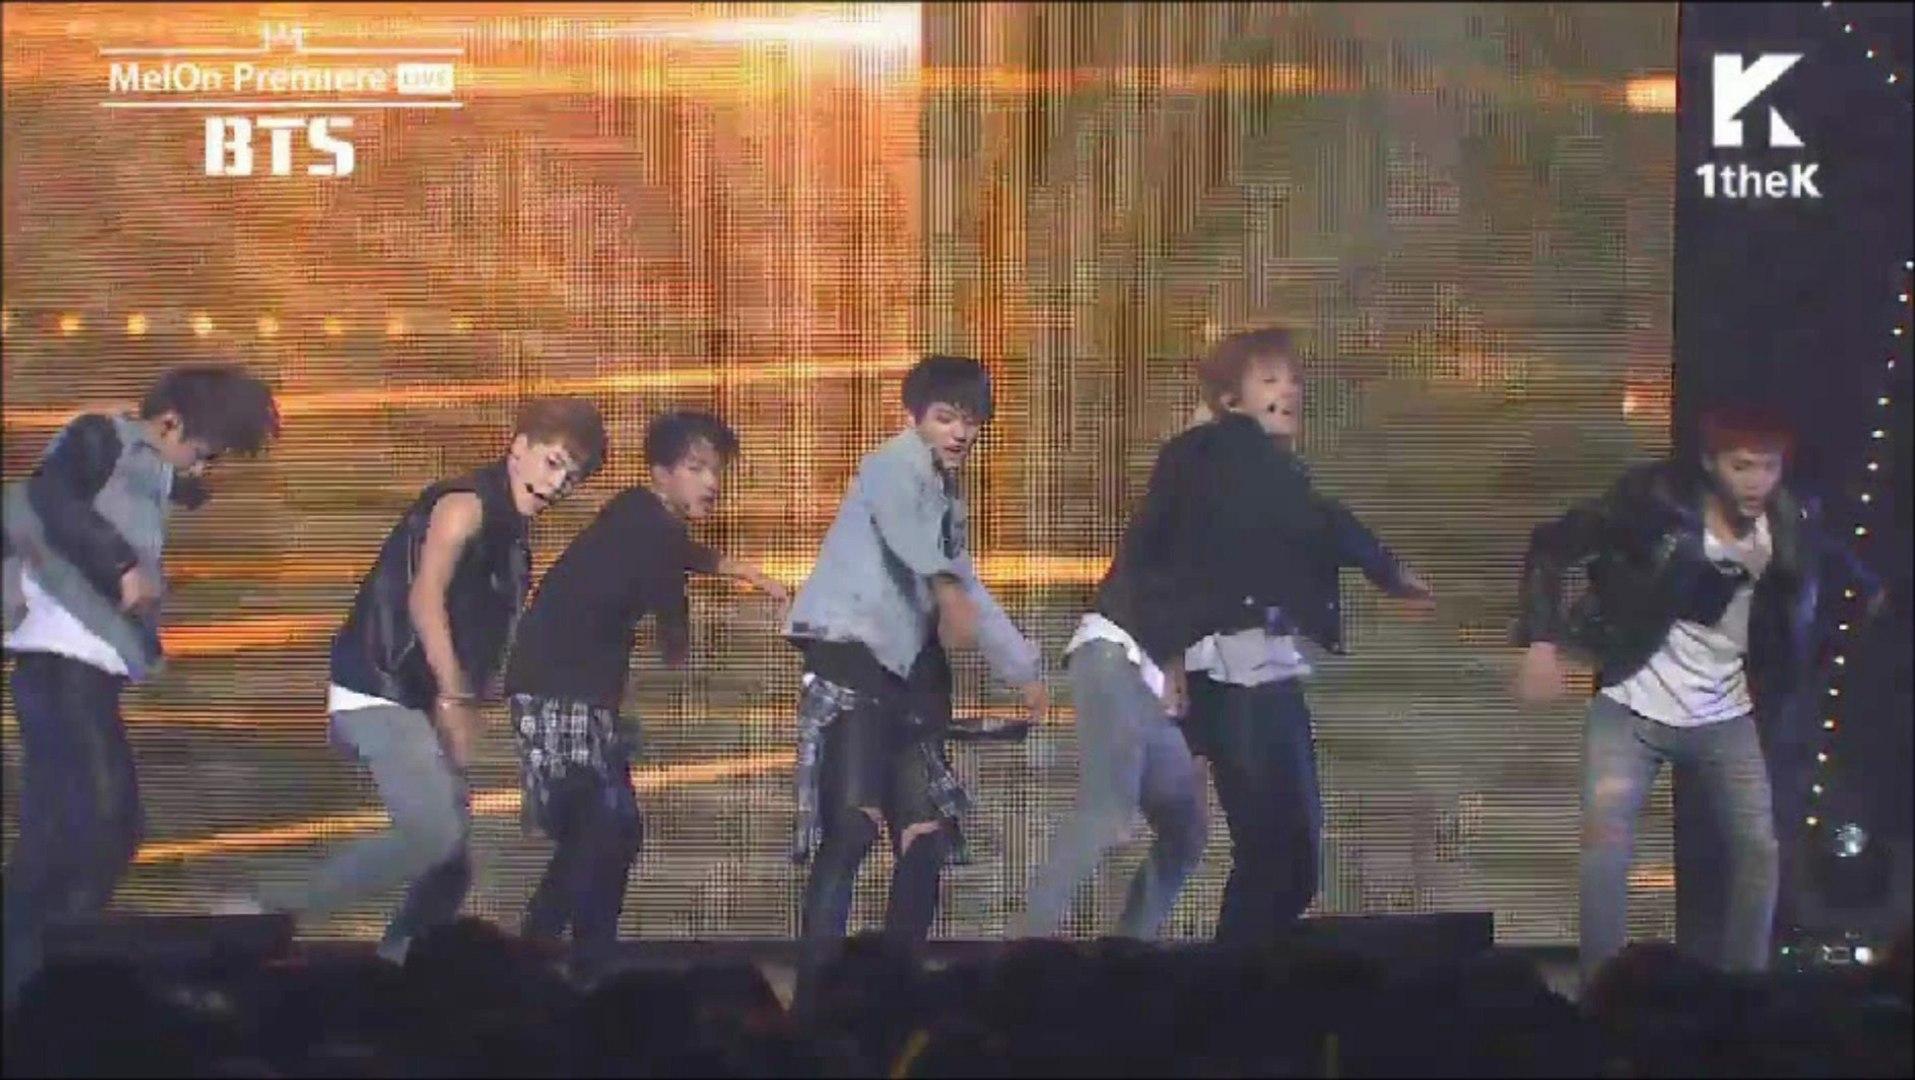 140819 BTS Comeback Showcase BOY IN LUV + ENDING Video